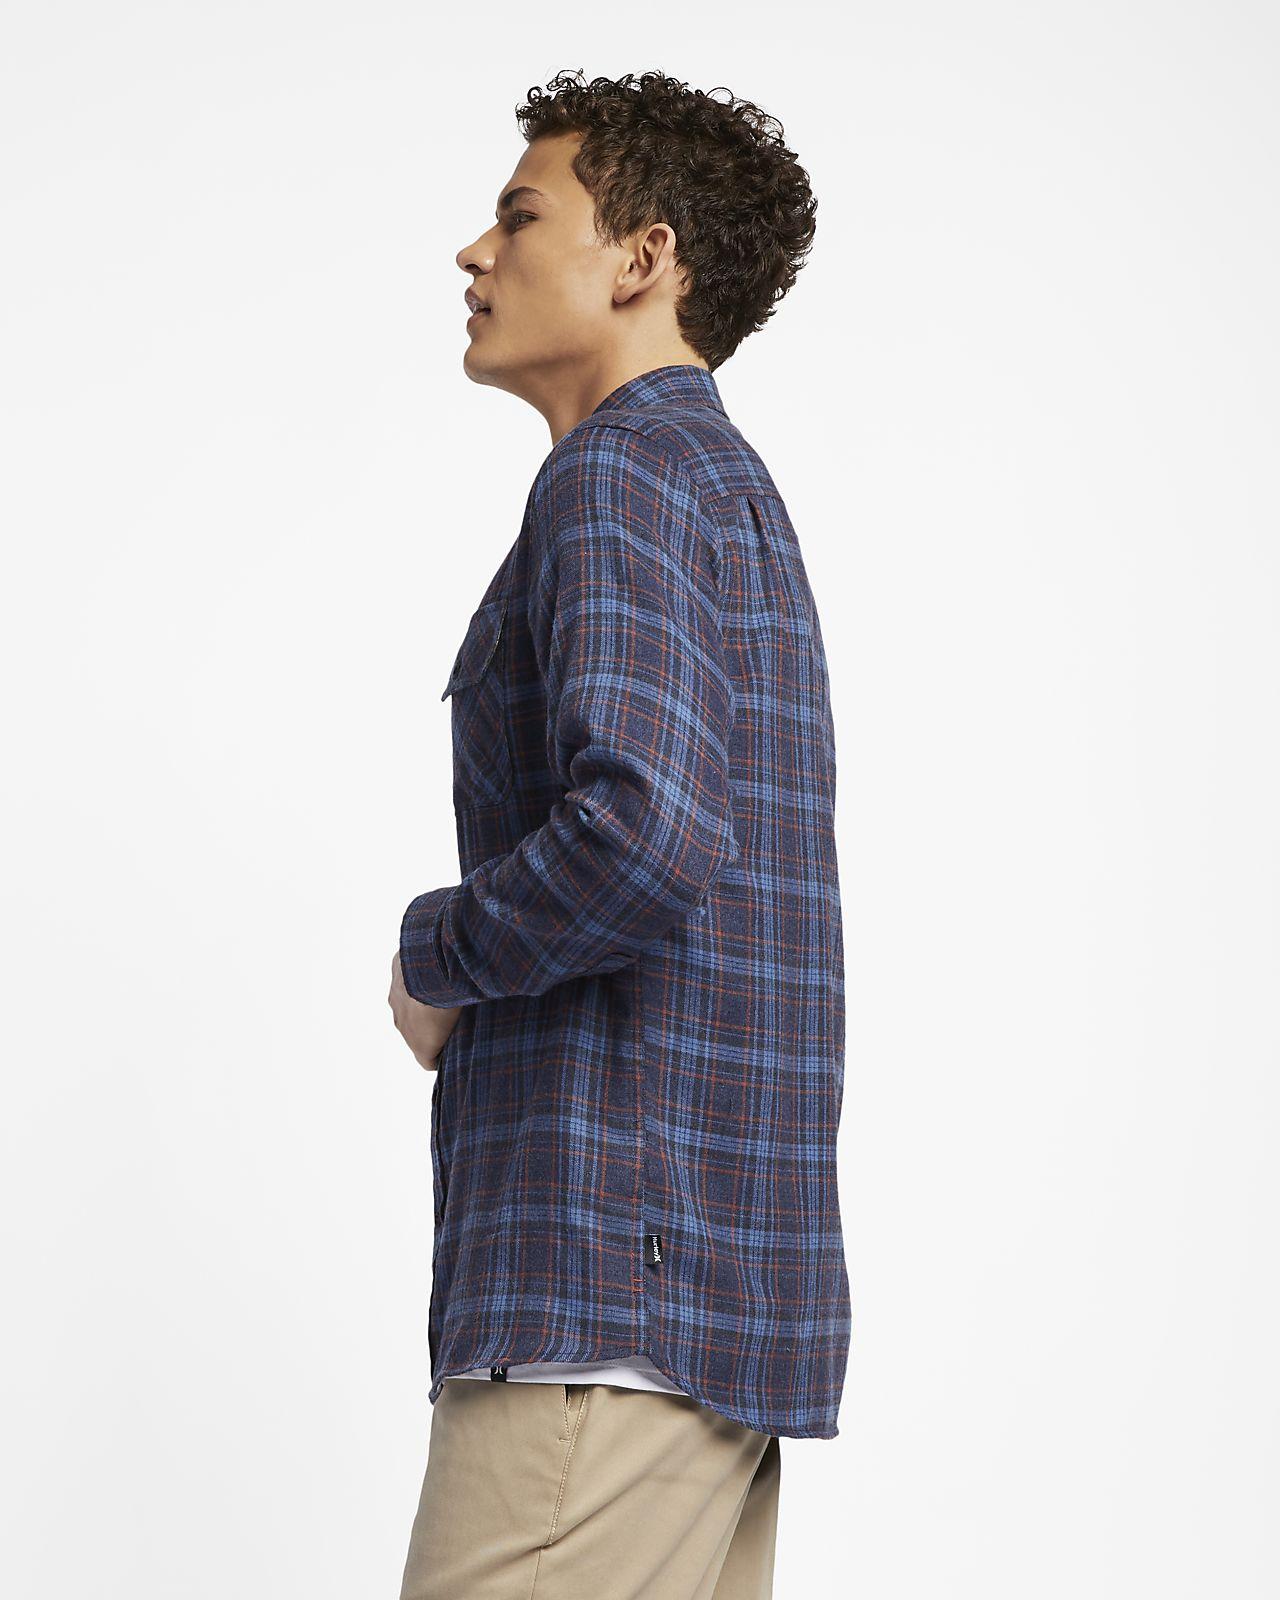 a4fe69f1dc9da7f Мужская фланелевая рубашка с длинным рукавом Hurley Walker. Nike.com RU